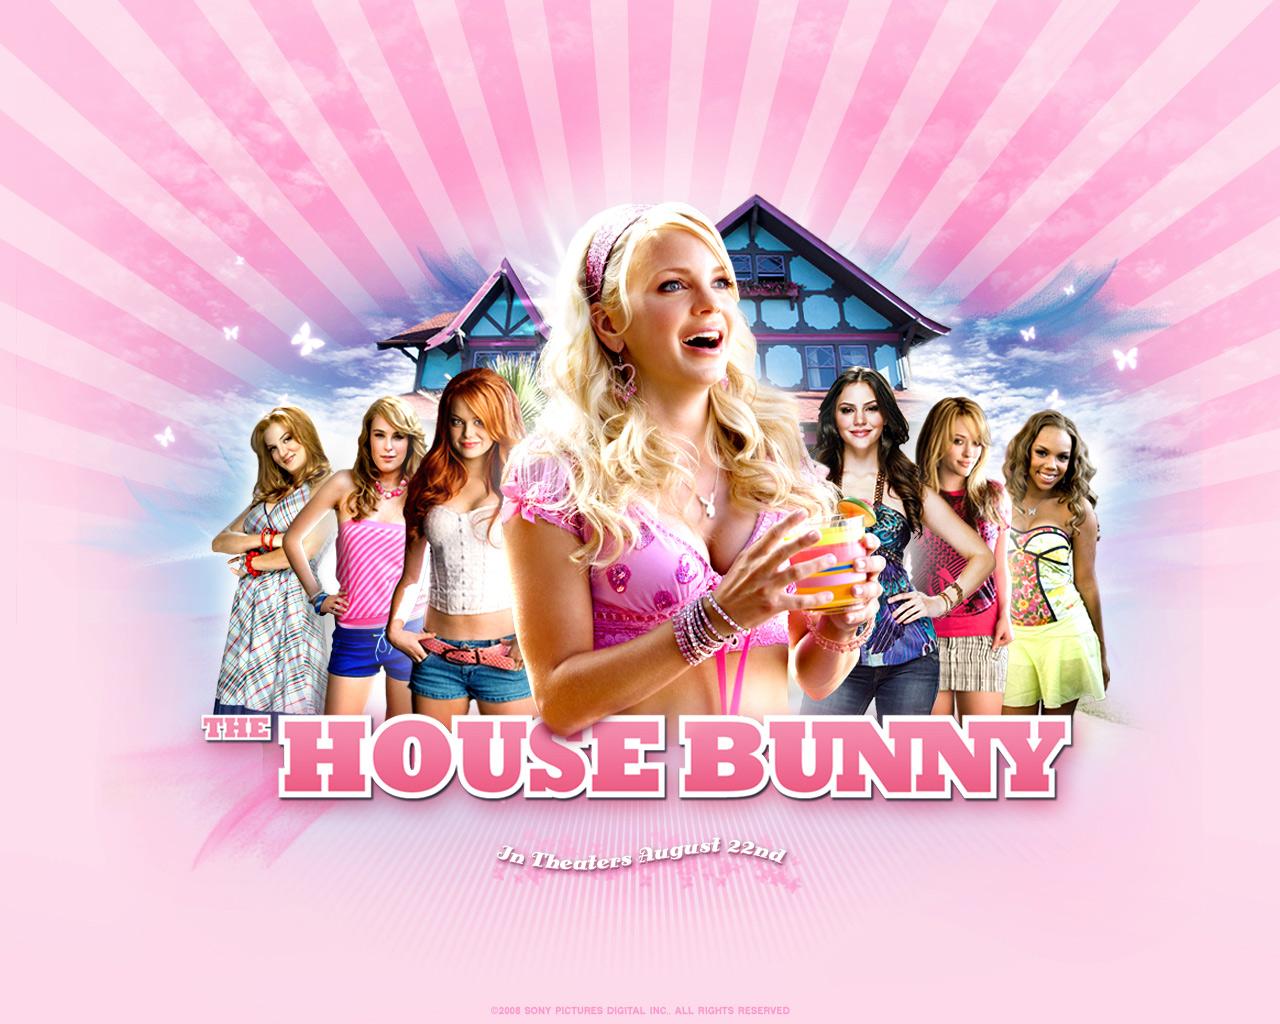 http://1.bp.blogspot.com/-wGedqJCr_v4/TlaH1EhDZaI/AAAAAAAABCY/zUMY0ePR7-c/s1600/The_House_Bunny%25252C_2008%25252C_Anna_Faris%25252C_Emma_Stone%25252C_Katharine_McPhee.jpg